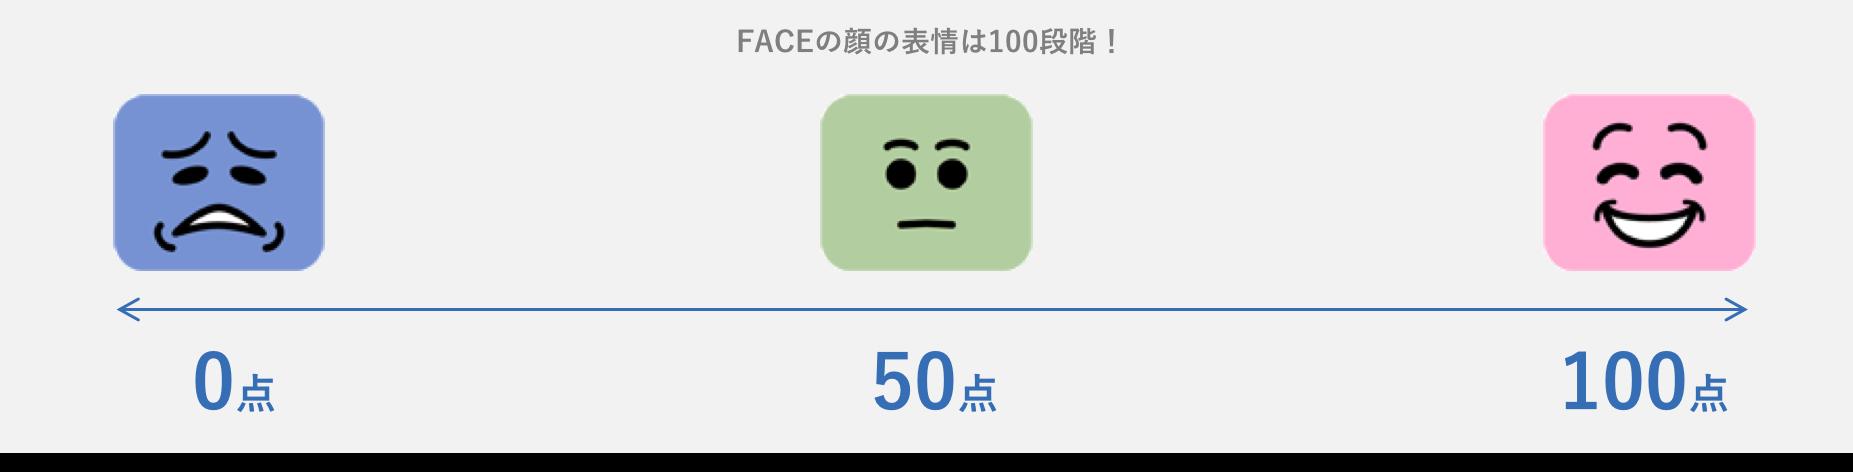 Face顔の表情